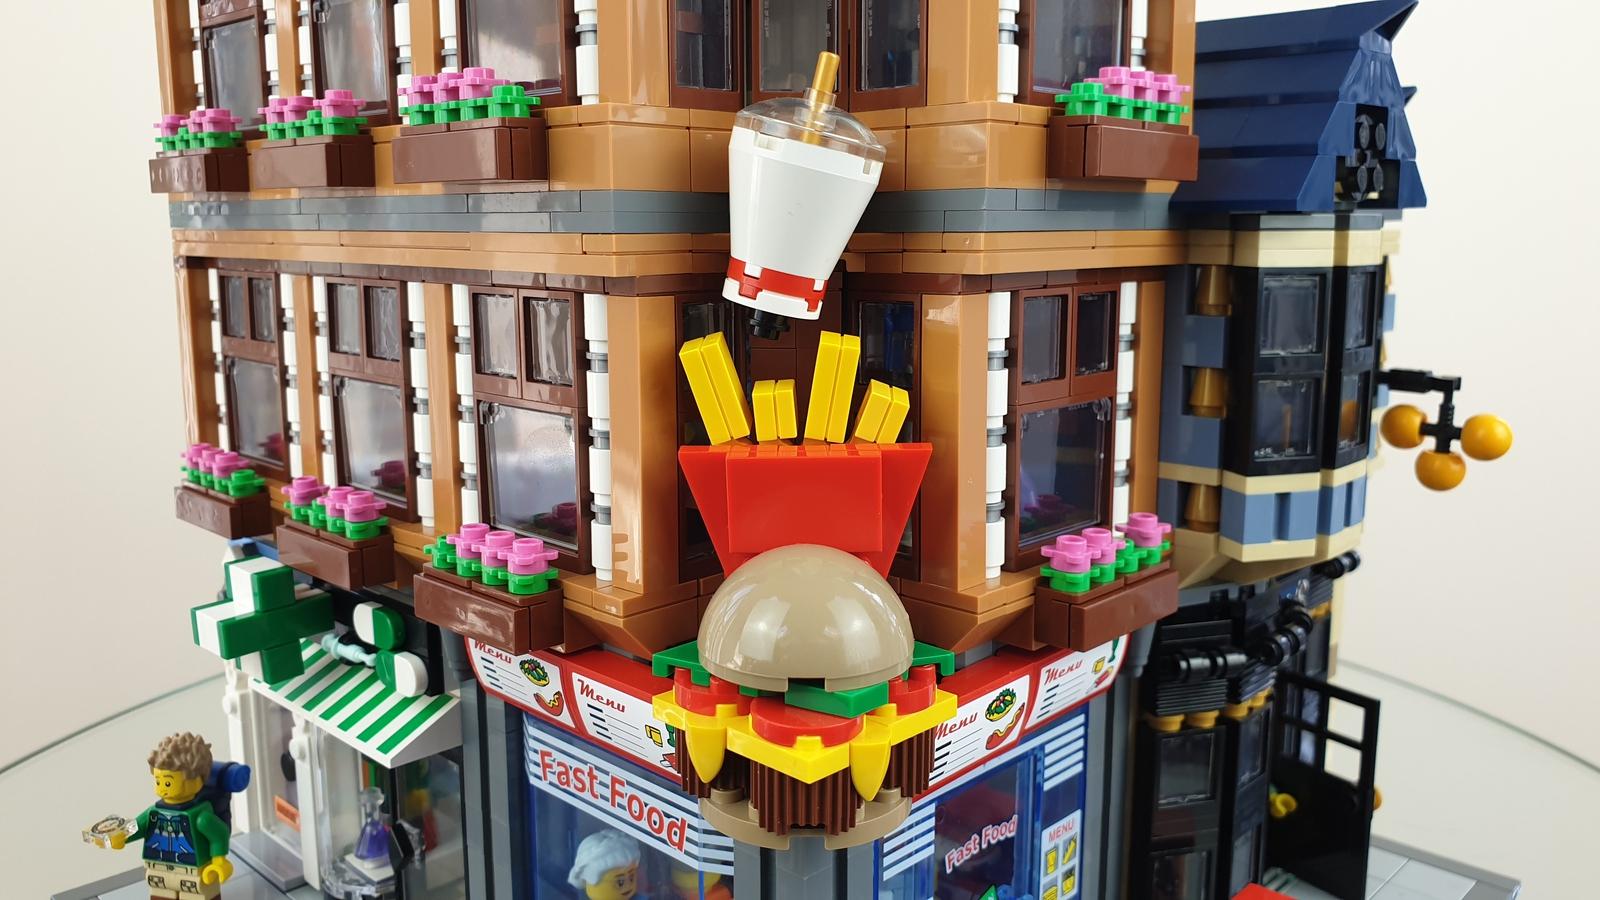 lego-ideas-fast-food-corner-robinhoodbricks-2 zusammengebaut.com